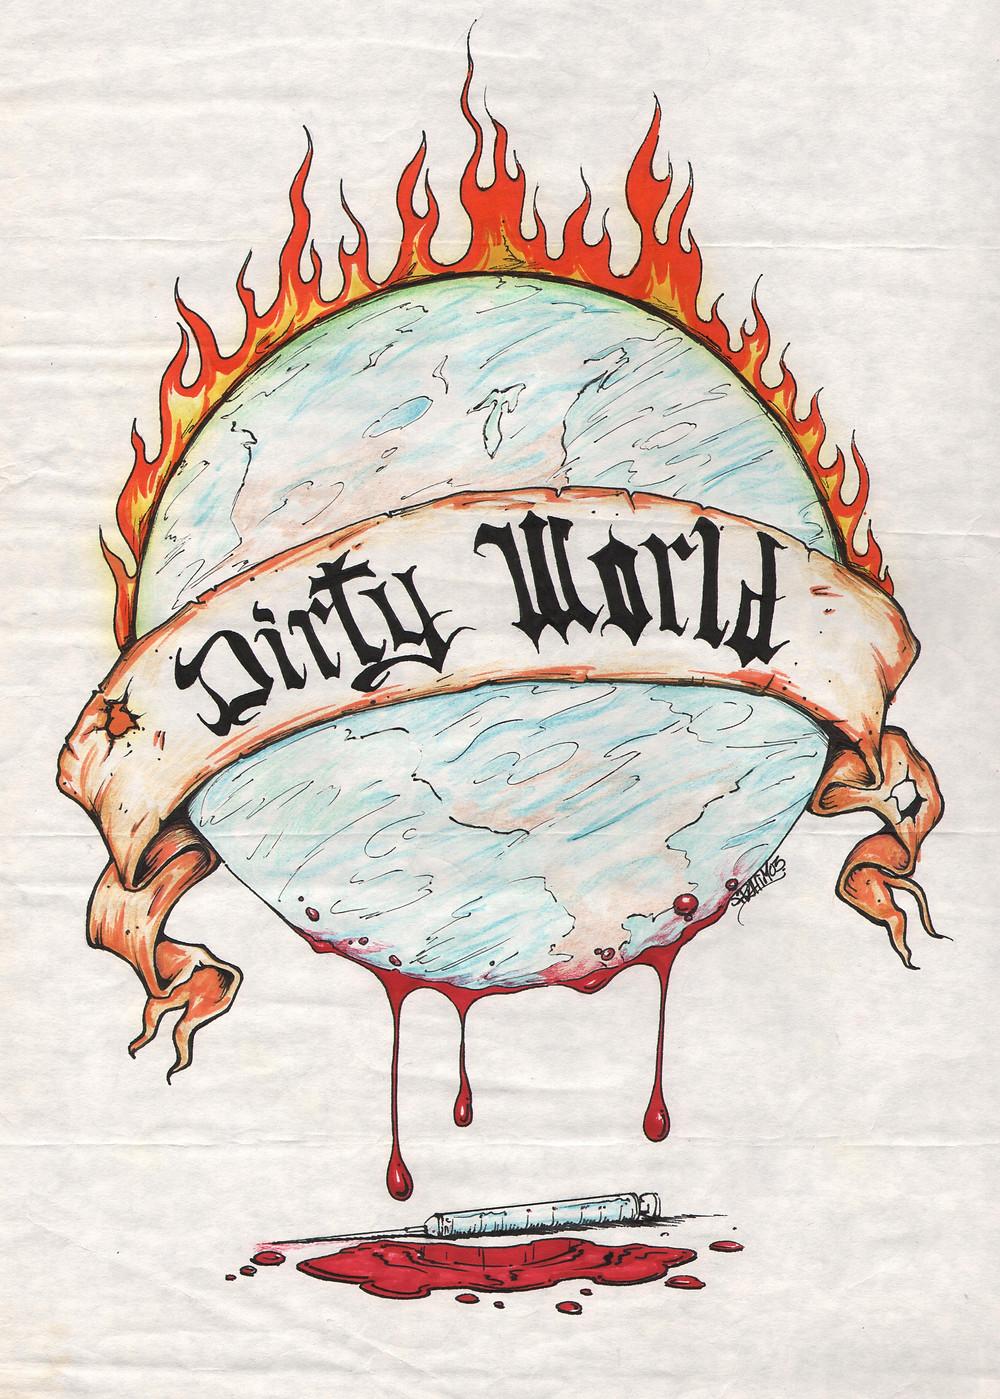 Dirty World by Shahied Abdur-Rahim